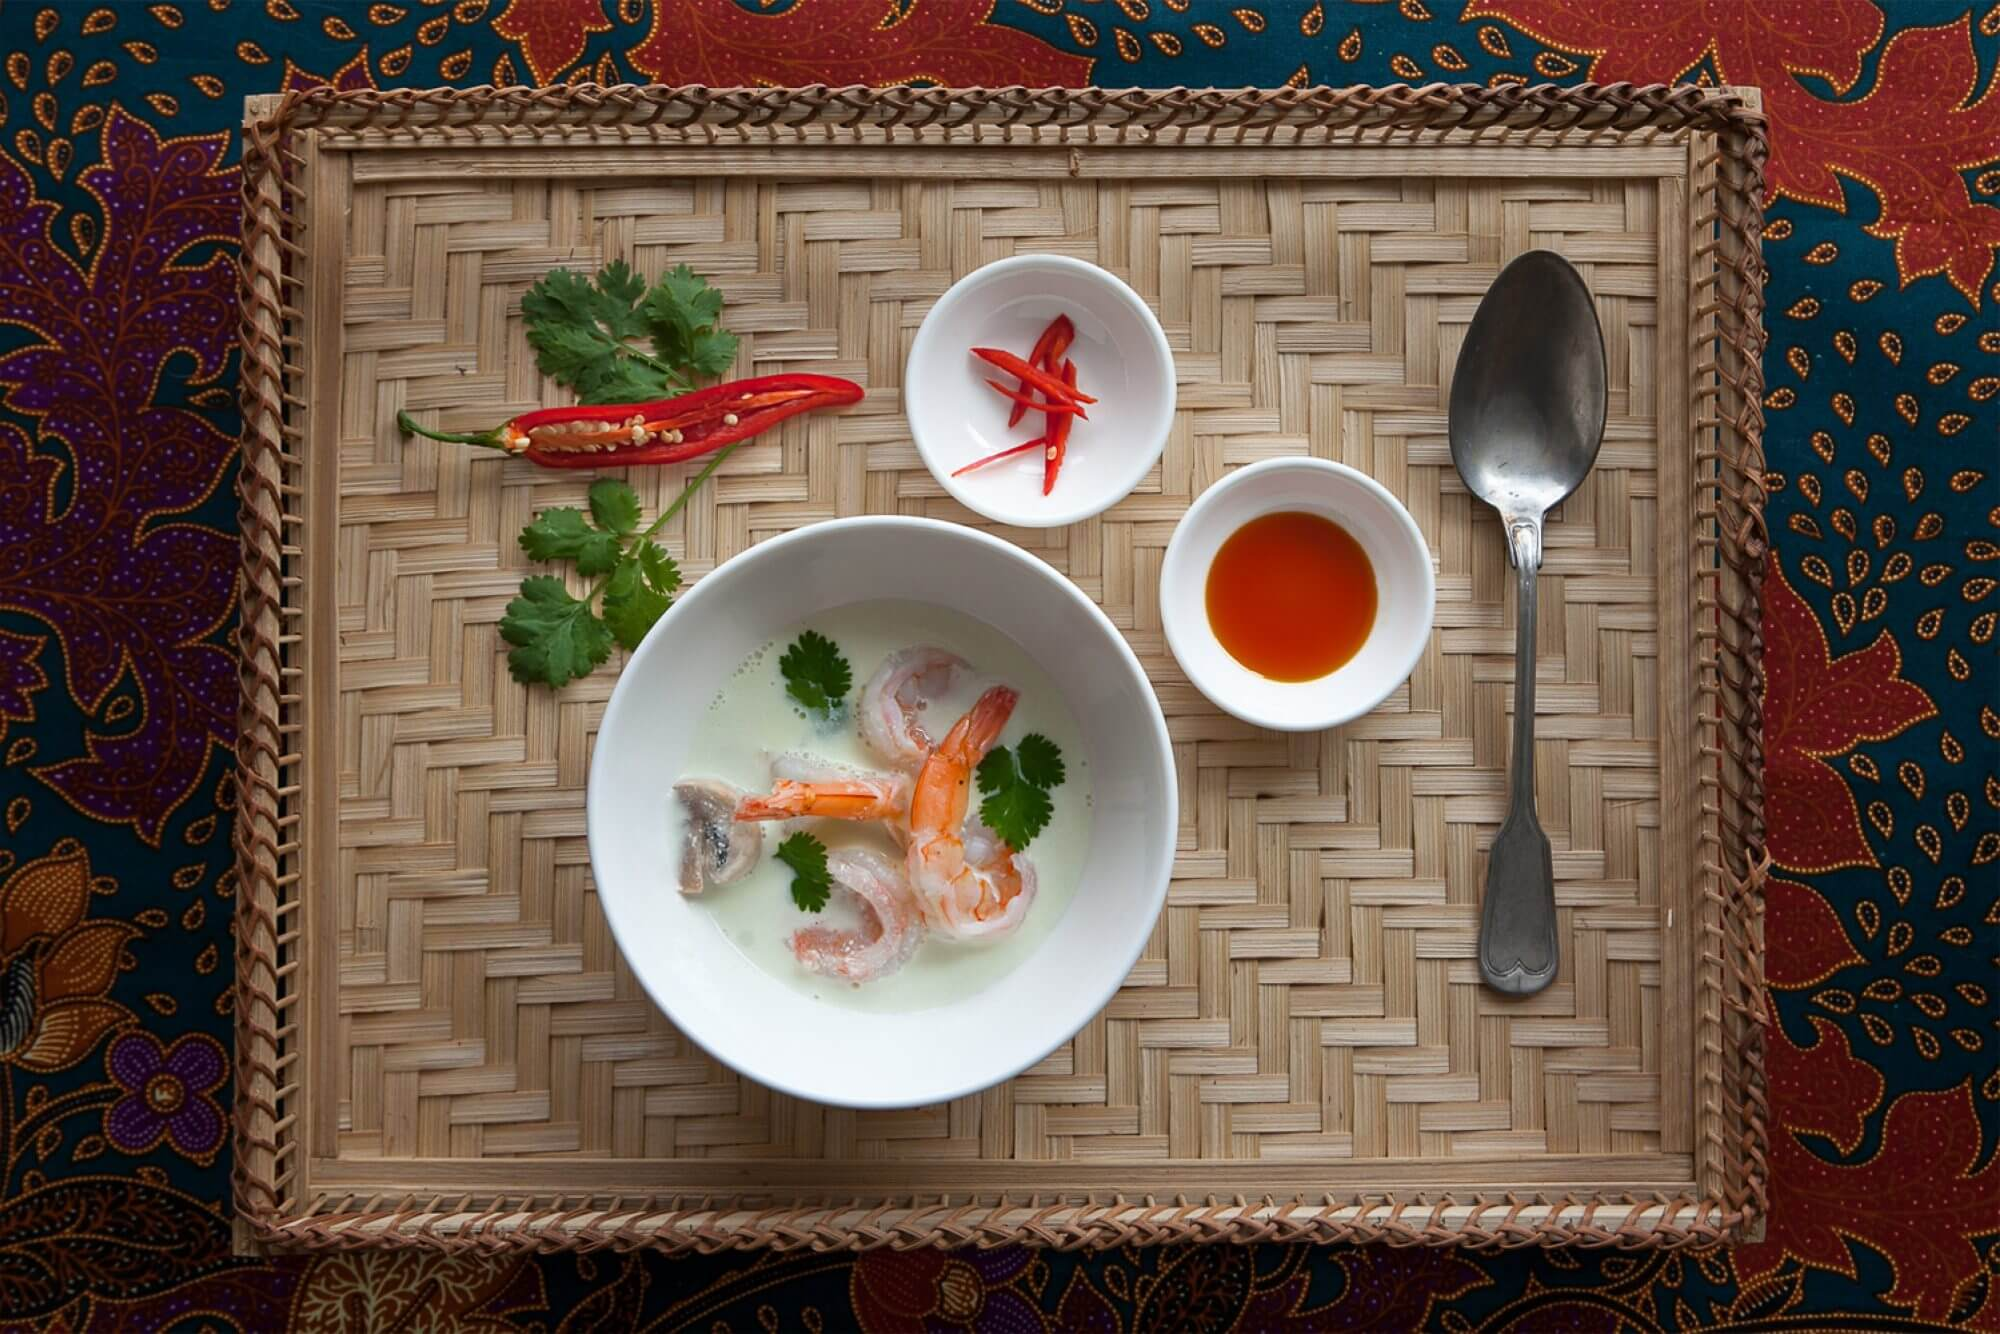 Afbeelding Phonsawan Thai Cuisine - Theaterwijzer